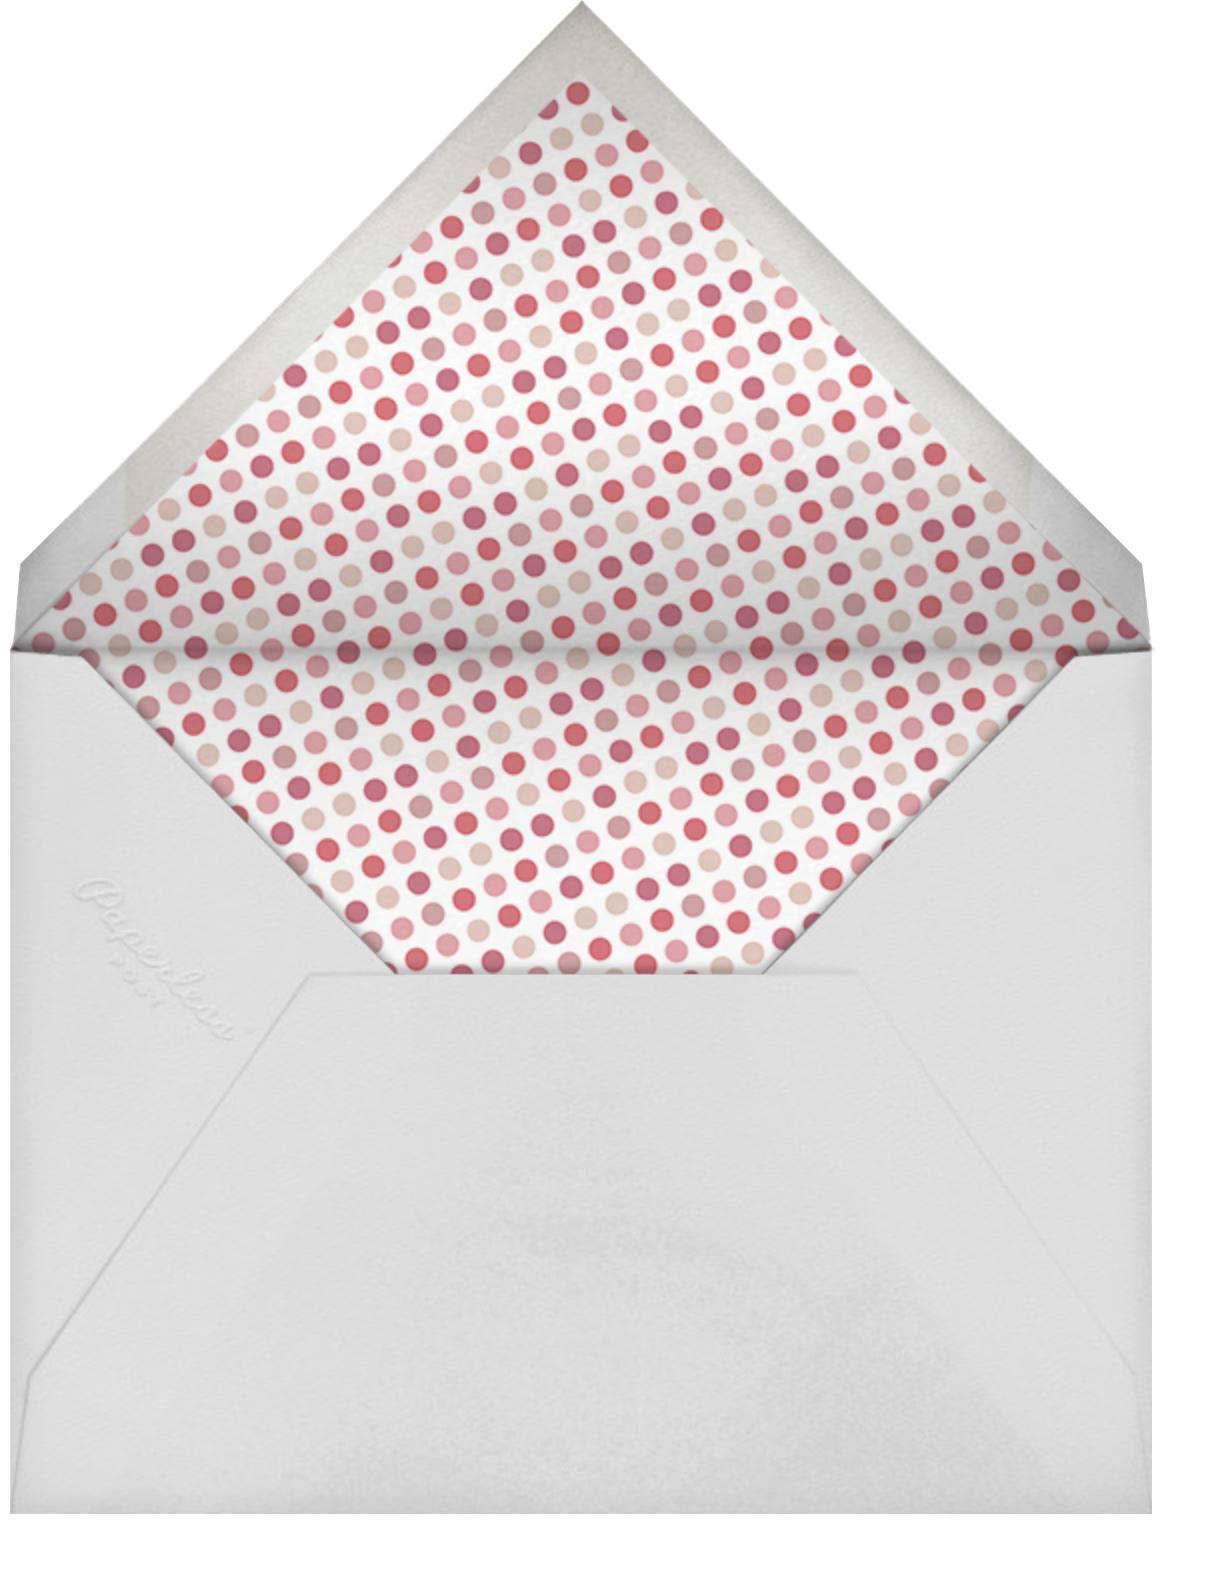 Bucket of Popcorn - Pink - Paperless Post - Virtual parties - envelope back